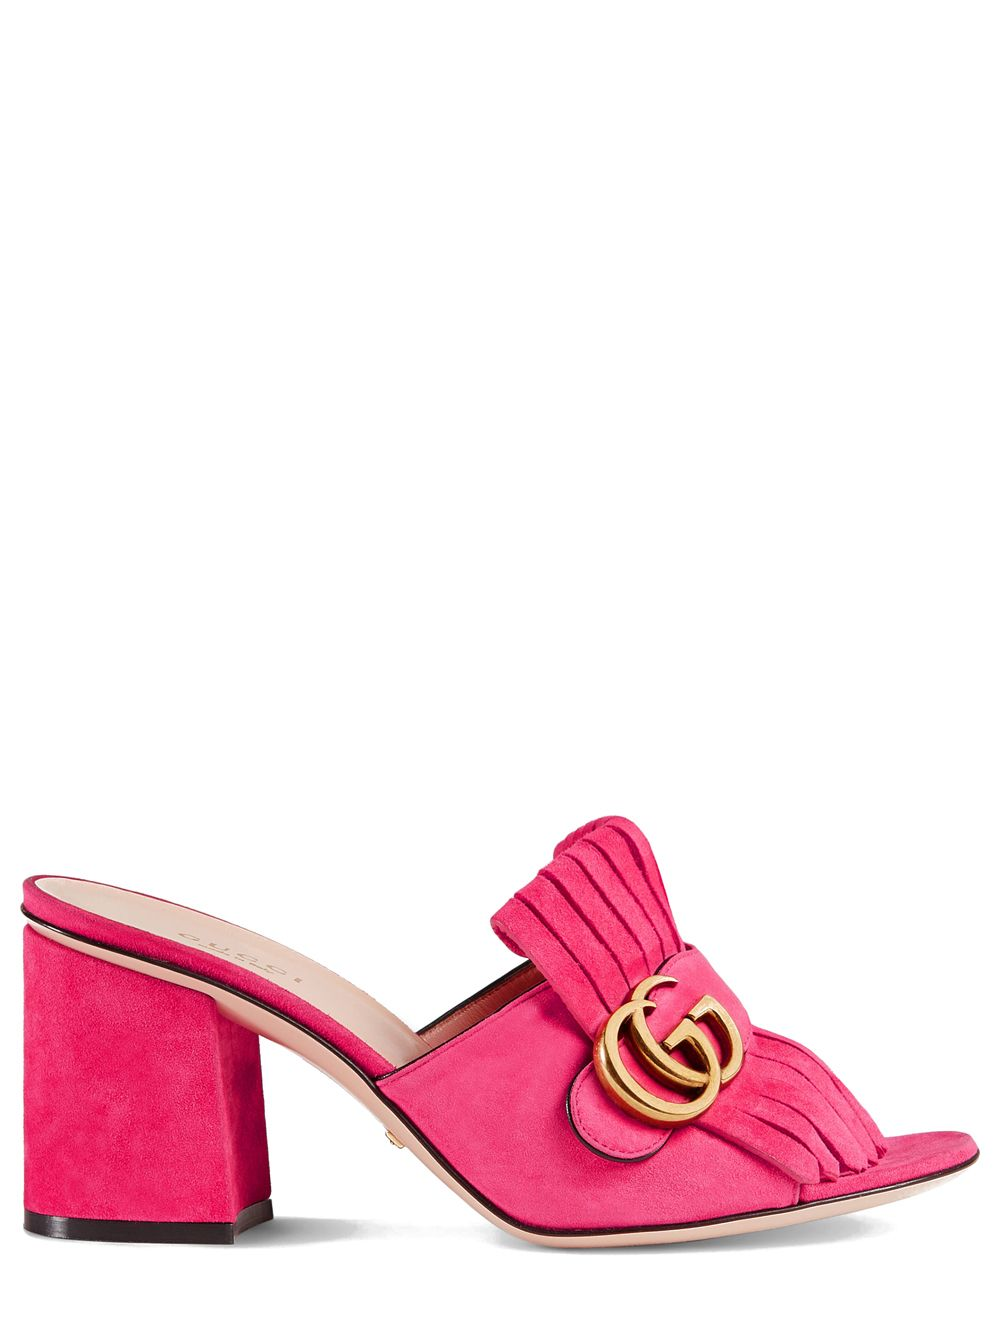 c7954af08ed Gucci Pink Suede Mid-Heel Slide Mules